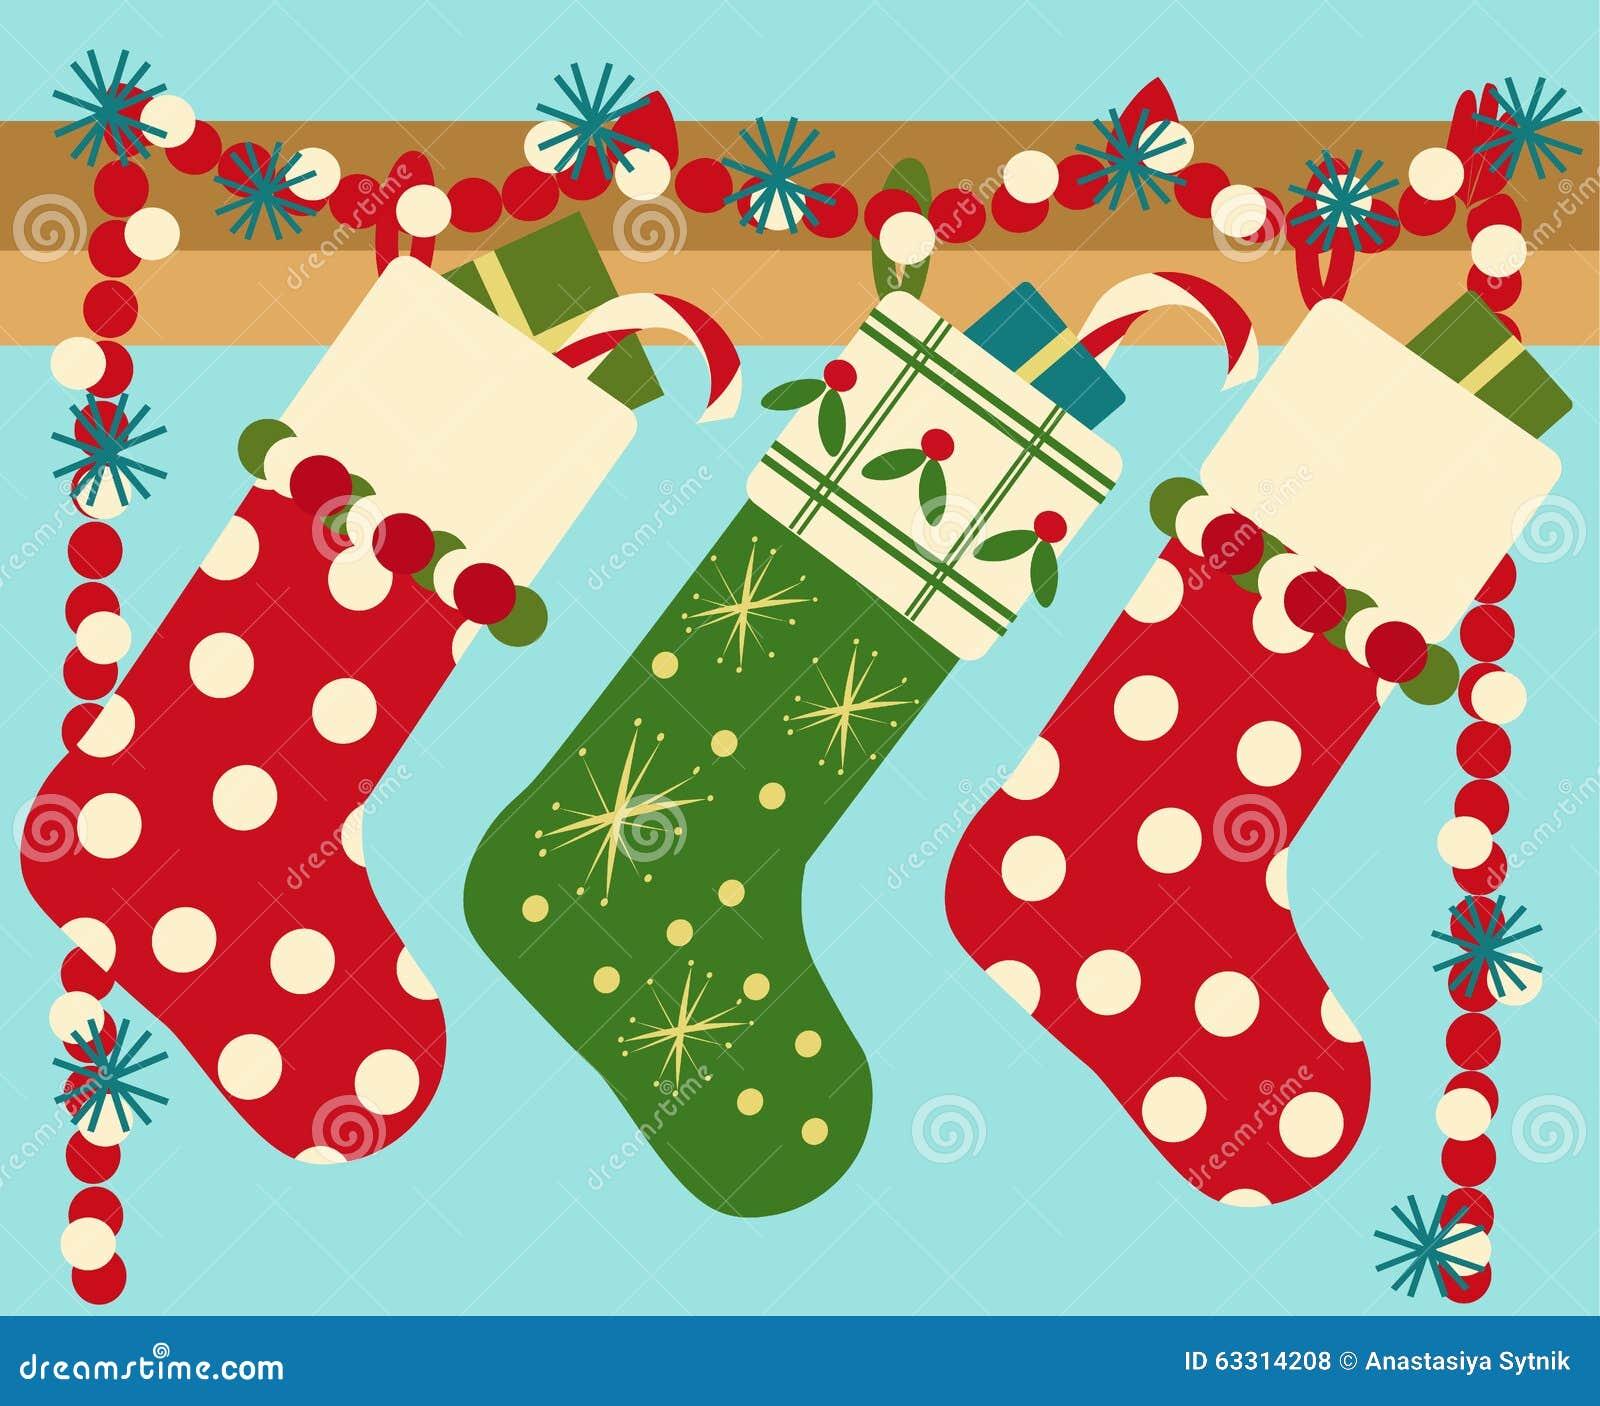 Hanging Christmas Socks With Present Stock Vector